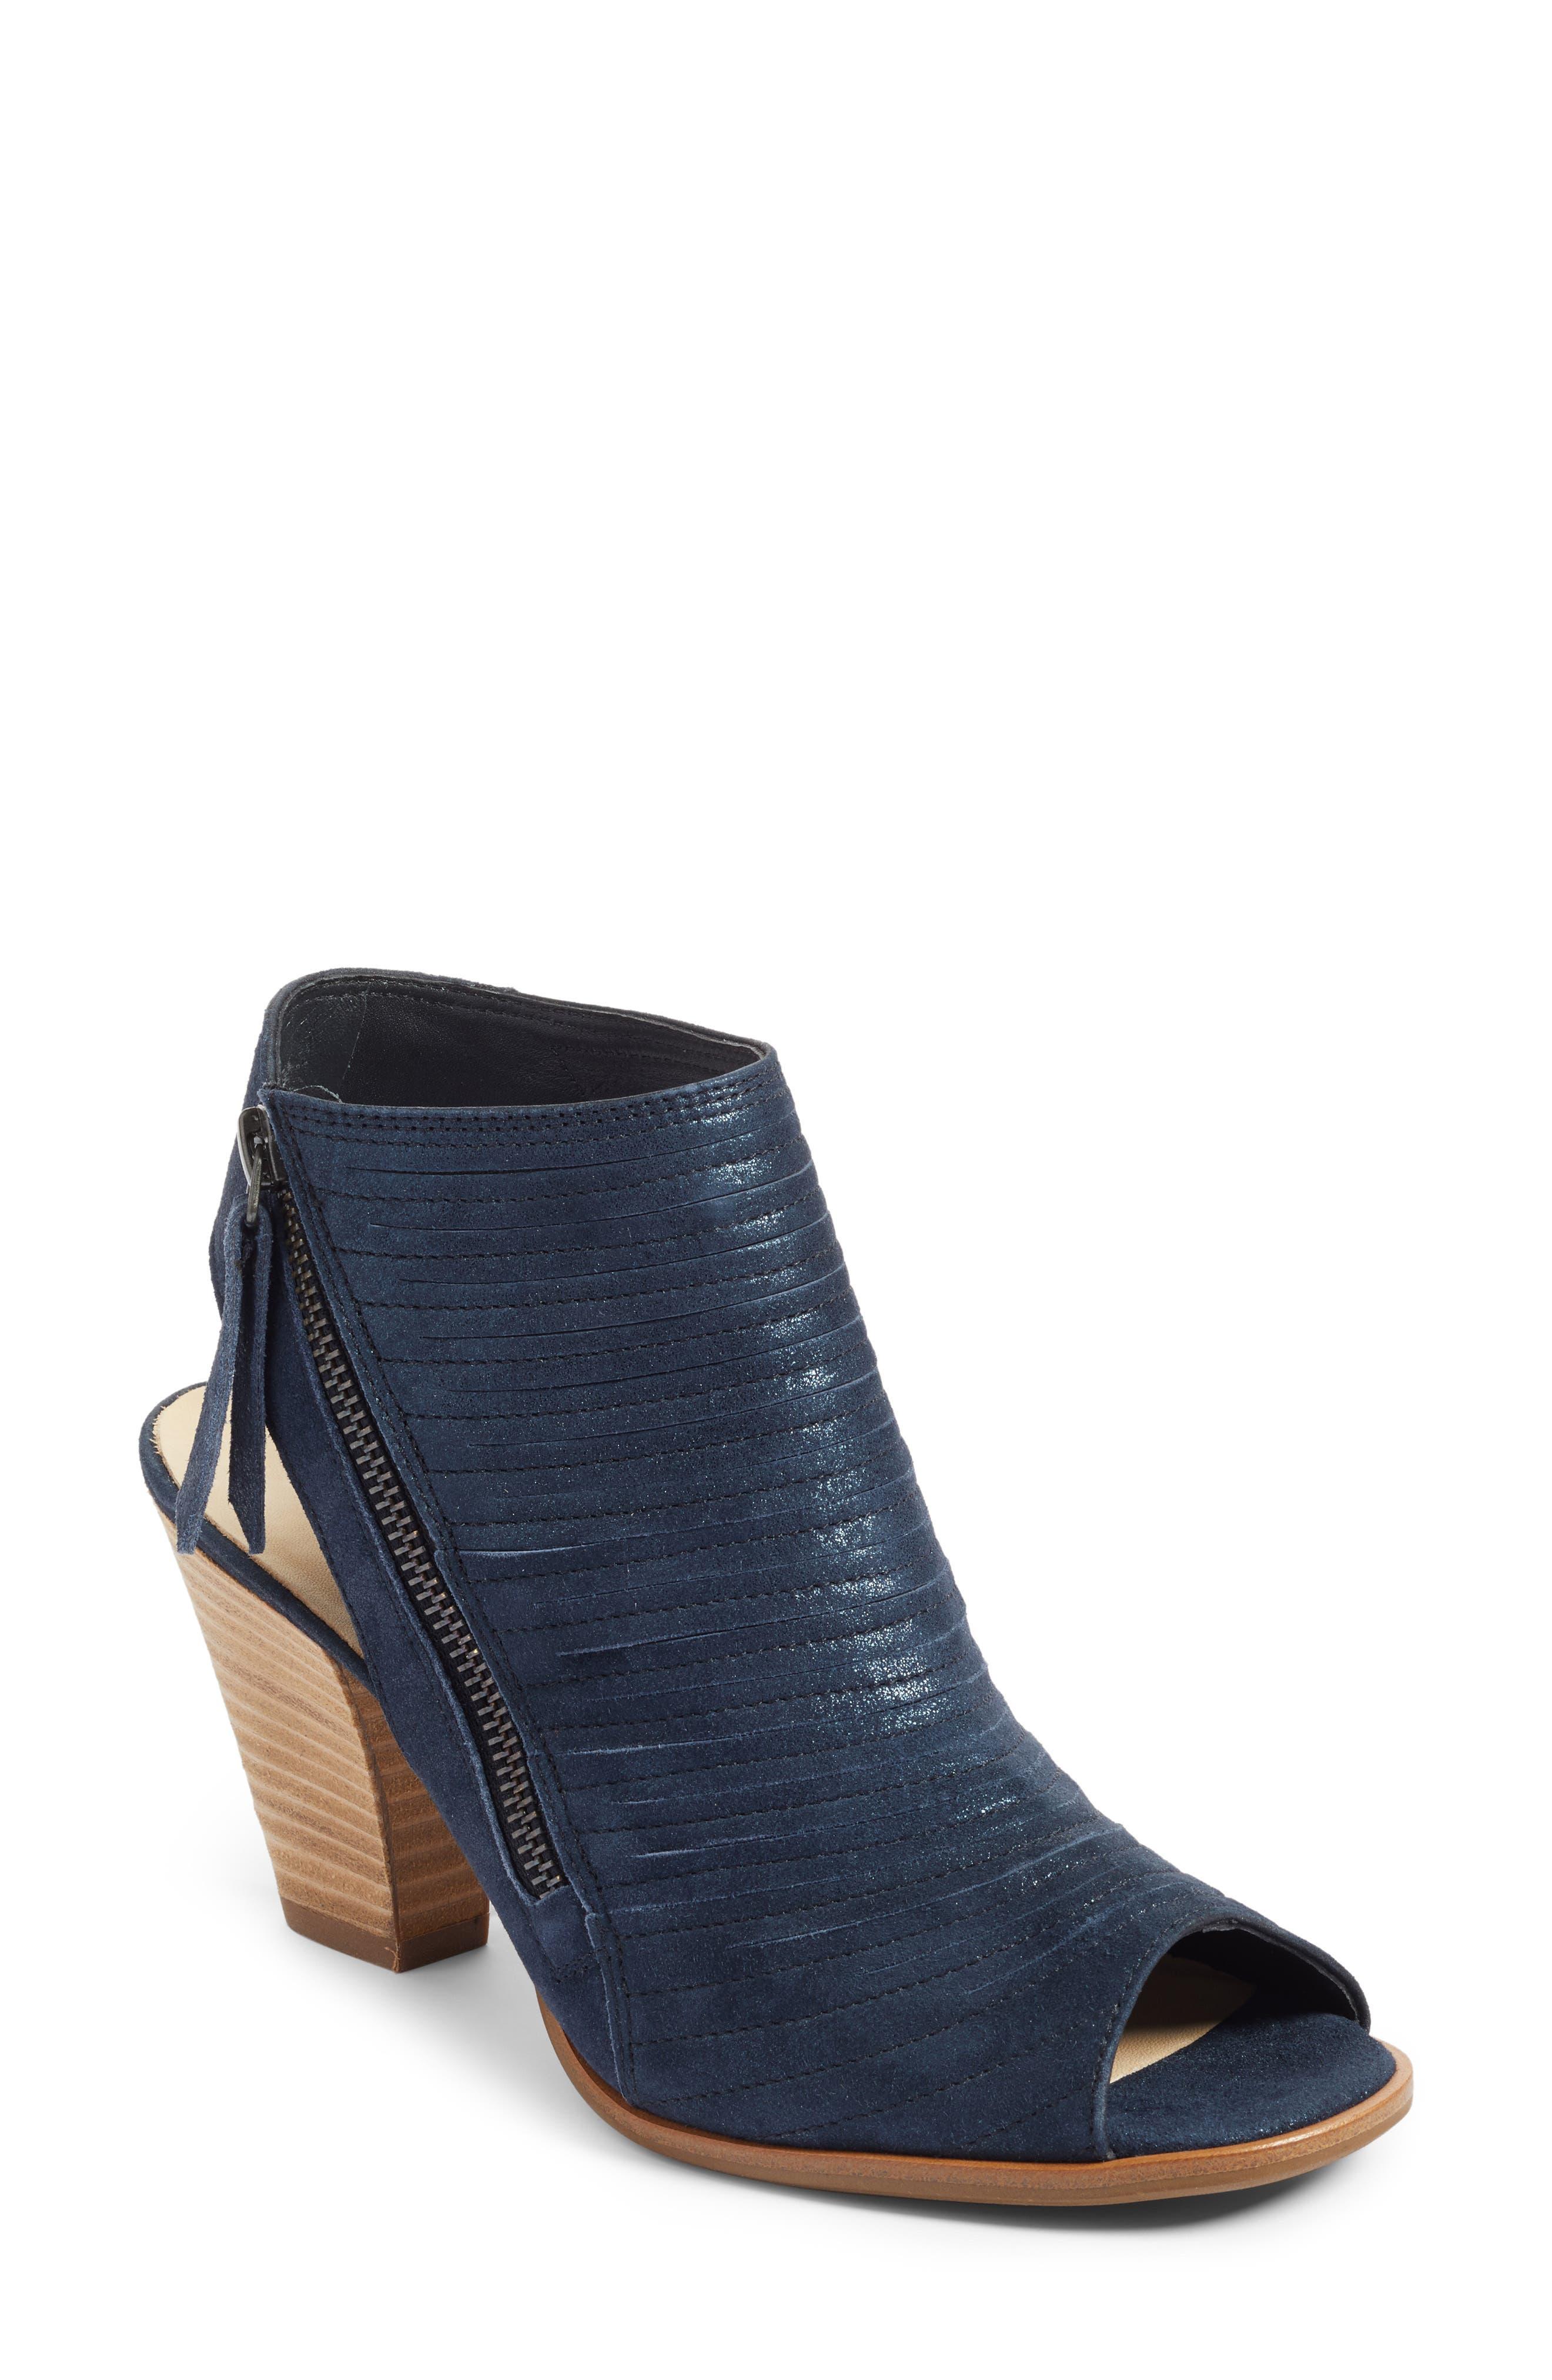 'Cayanne' Leather Peep Toe Sandal,                             Main thumbnail 9, color,